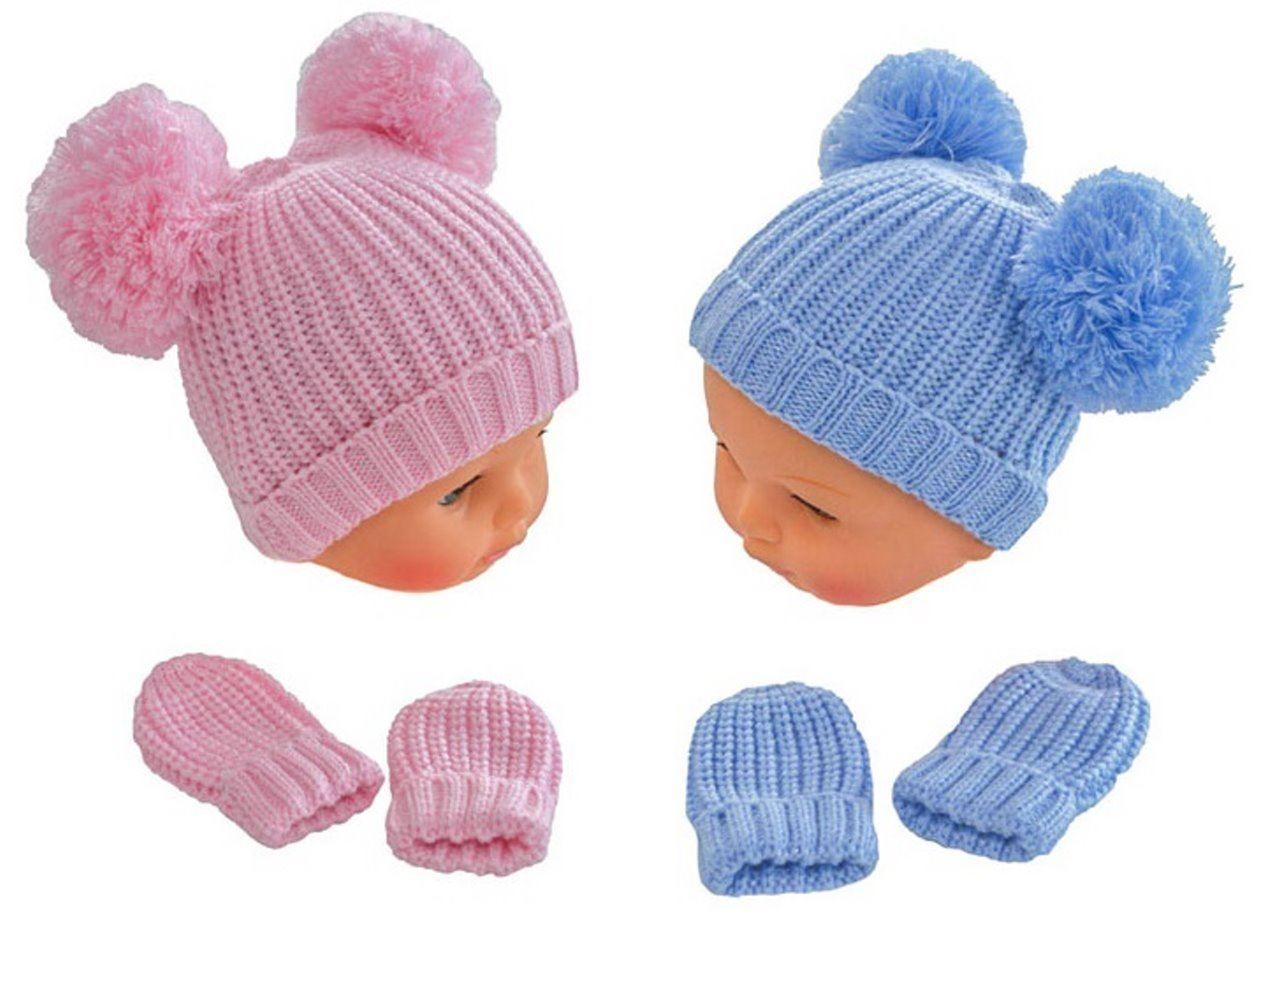 Baby Hat and Mittens Set Beanie Winter Blue Pink Outdoor Accessories Boys  Girls fdaa1fcd307